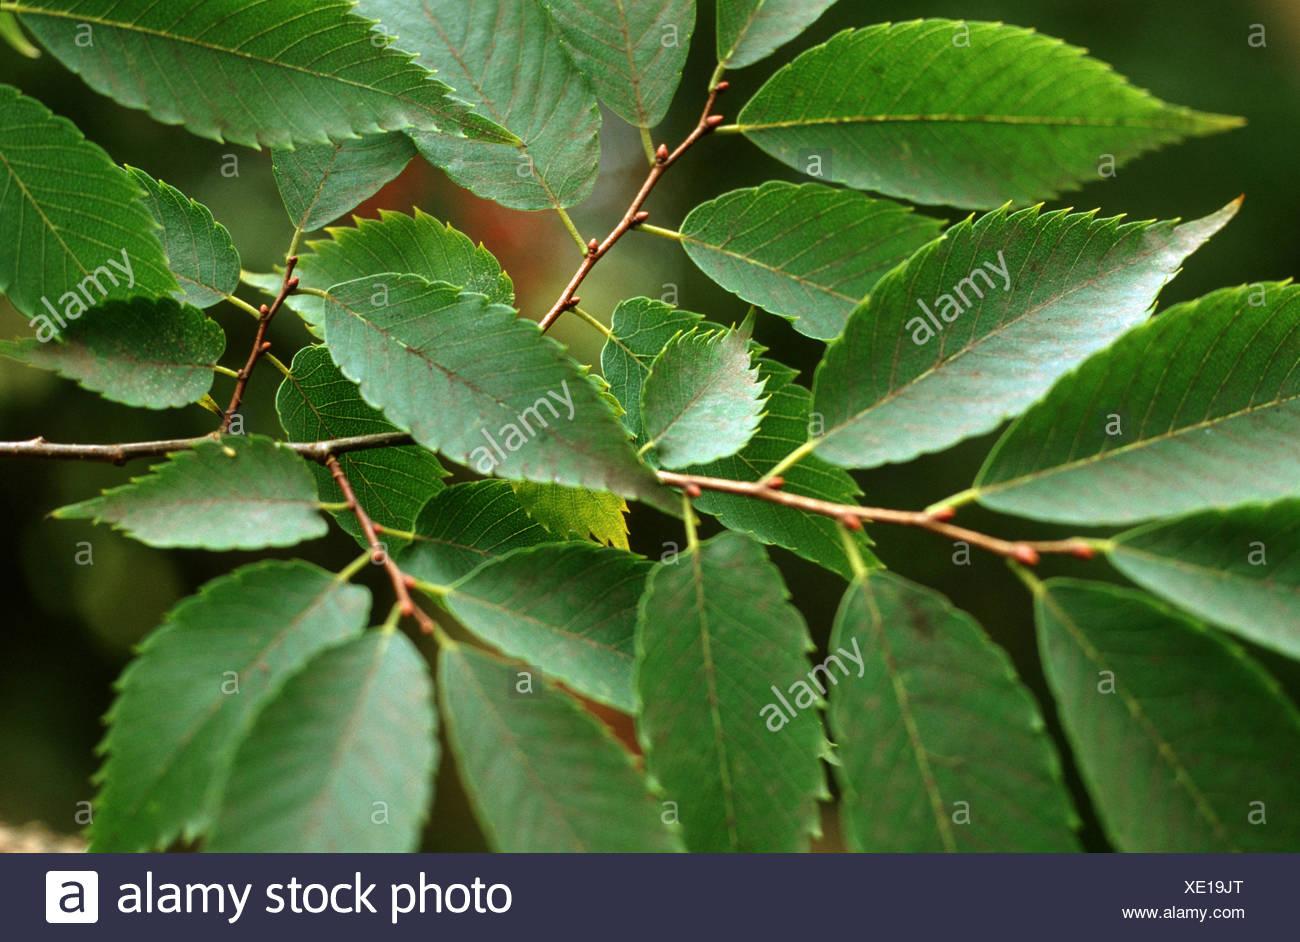 Japanese zelkova (Zelkova serrata, Zelkova acuminata, Zelkova hirta, Zelkova keaki ), branch - Stock Image